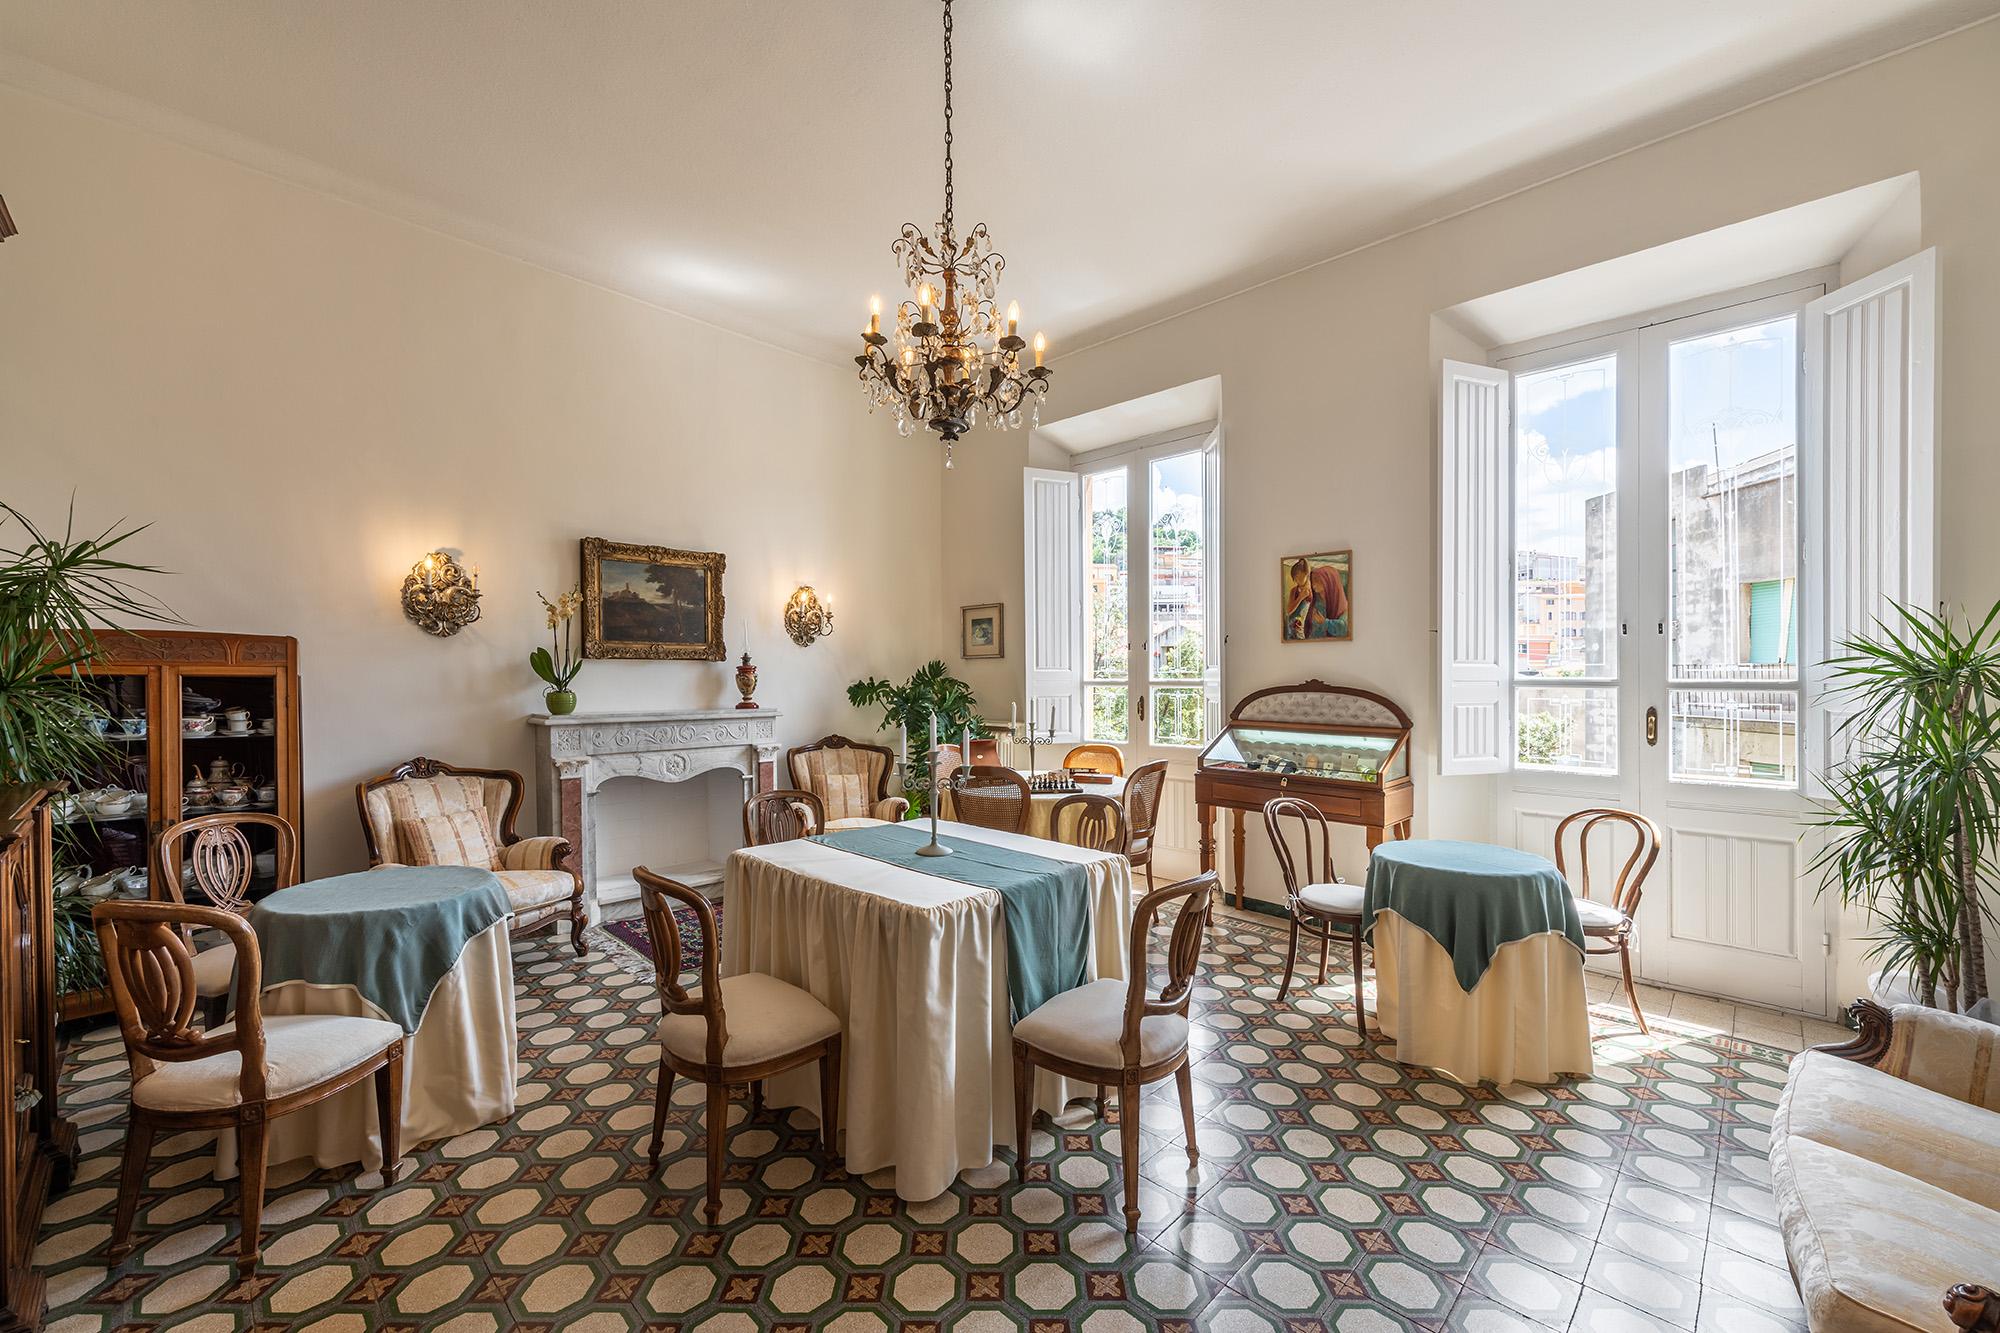 sala arredata colazioni - palazzo santa caterina dorgali